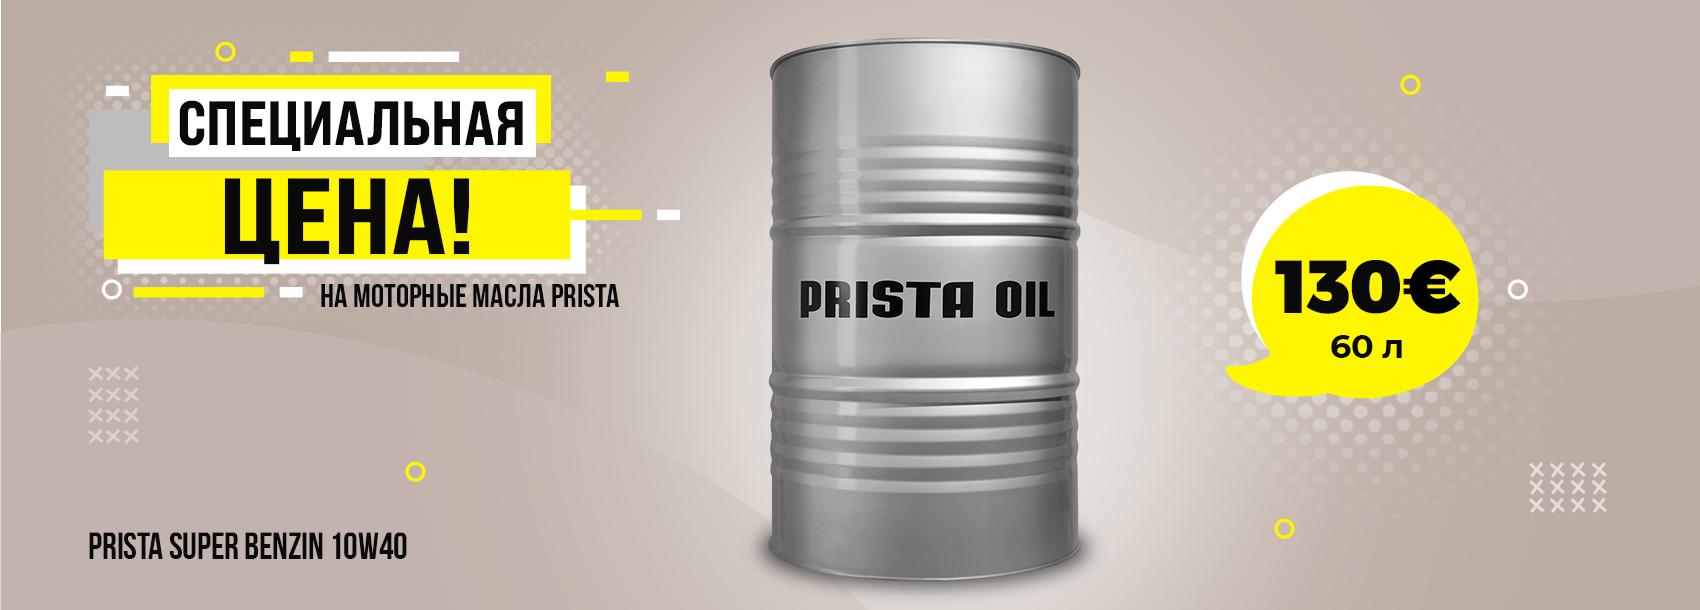 Специальная цена на моторные масла PRISTA!